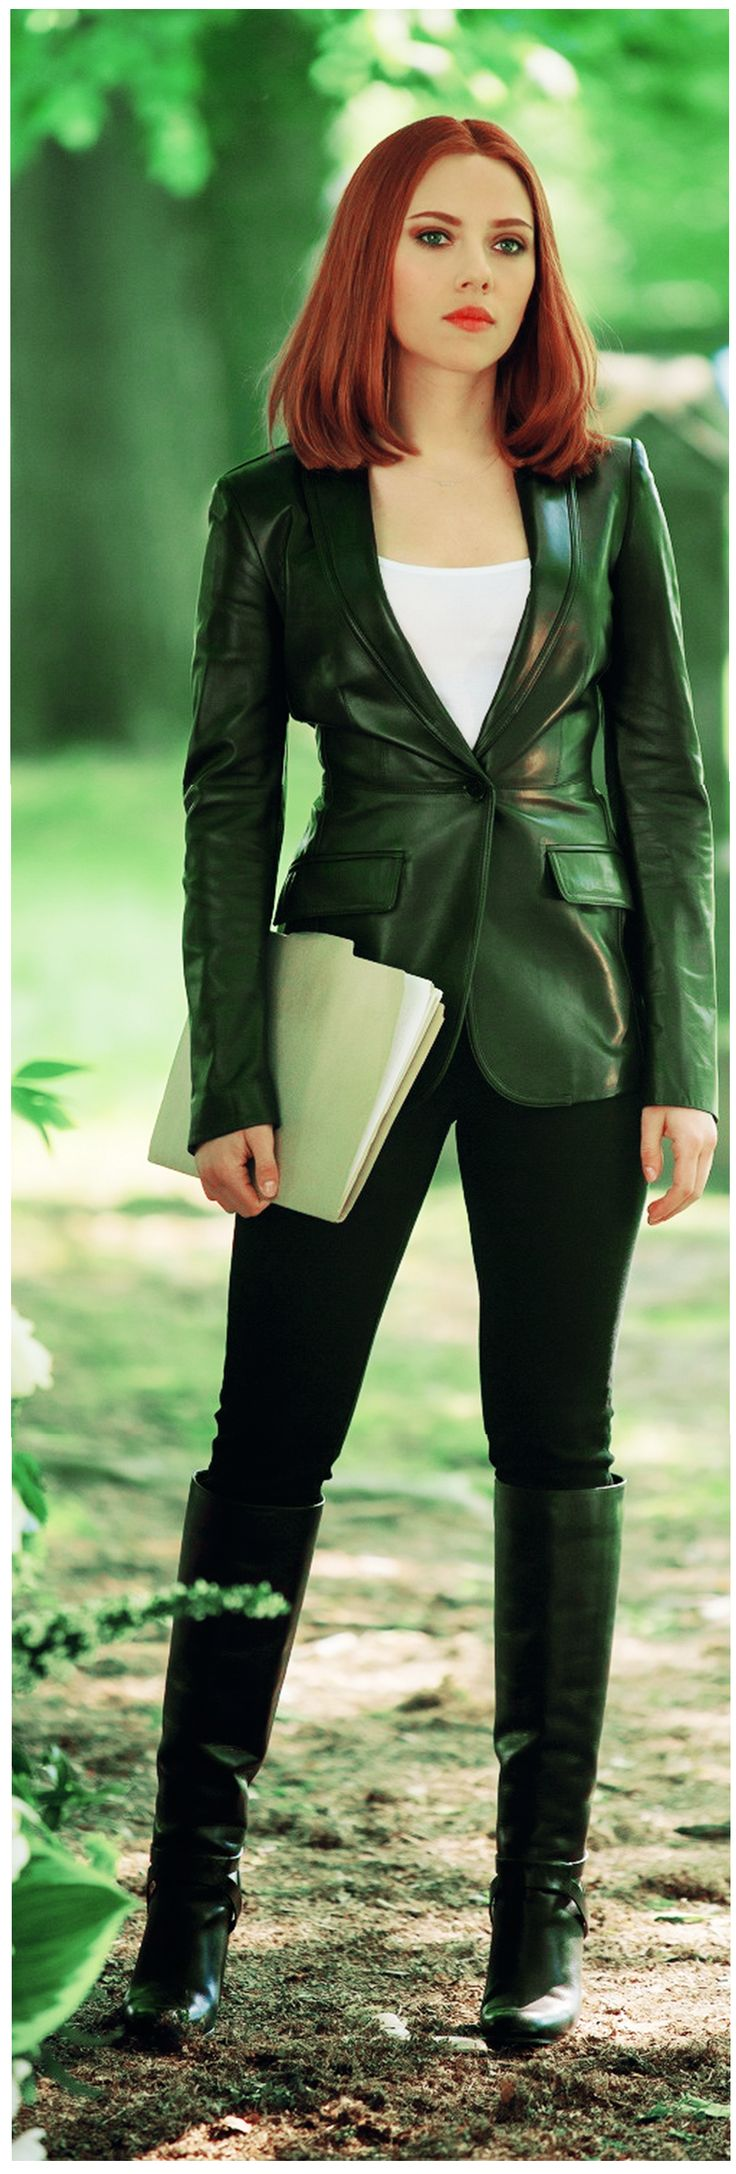 Gorgeous Natasha Romanoff: Scarlett Johansson